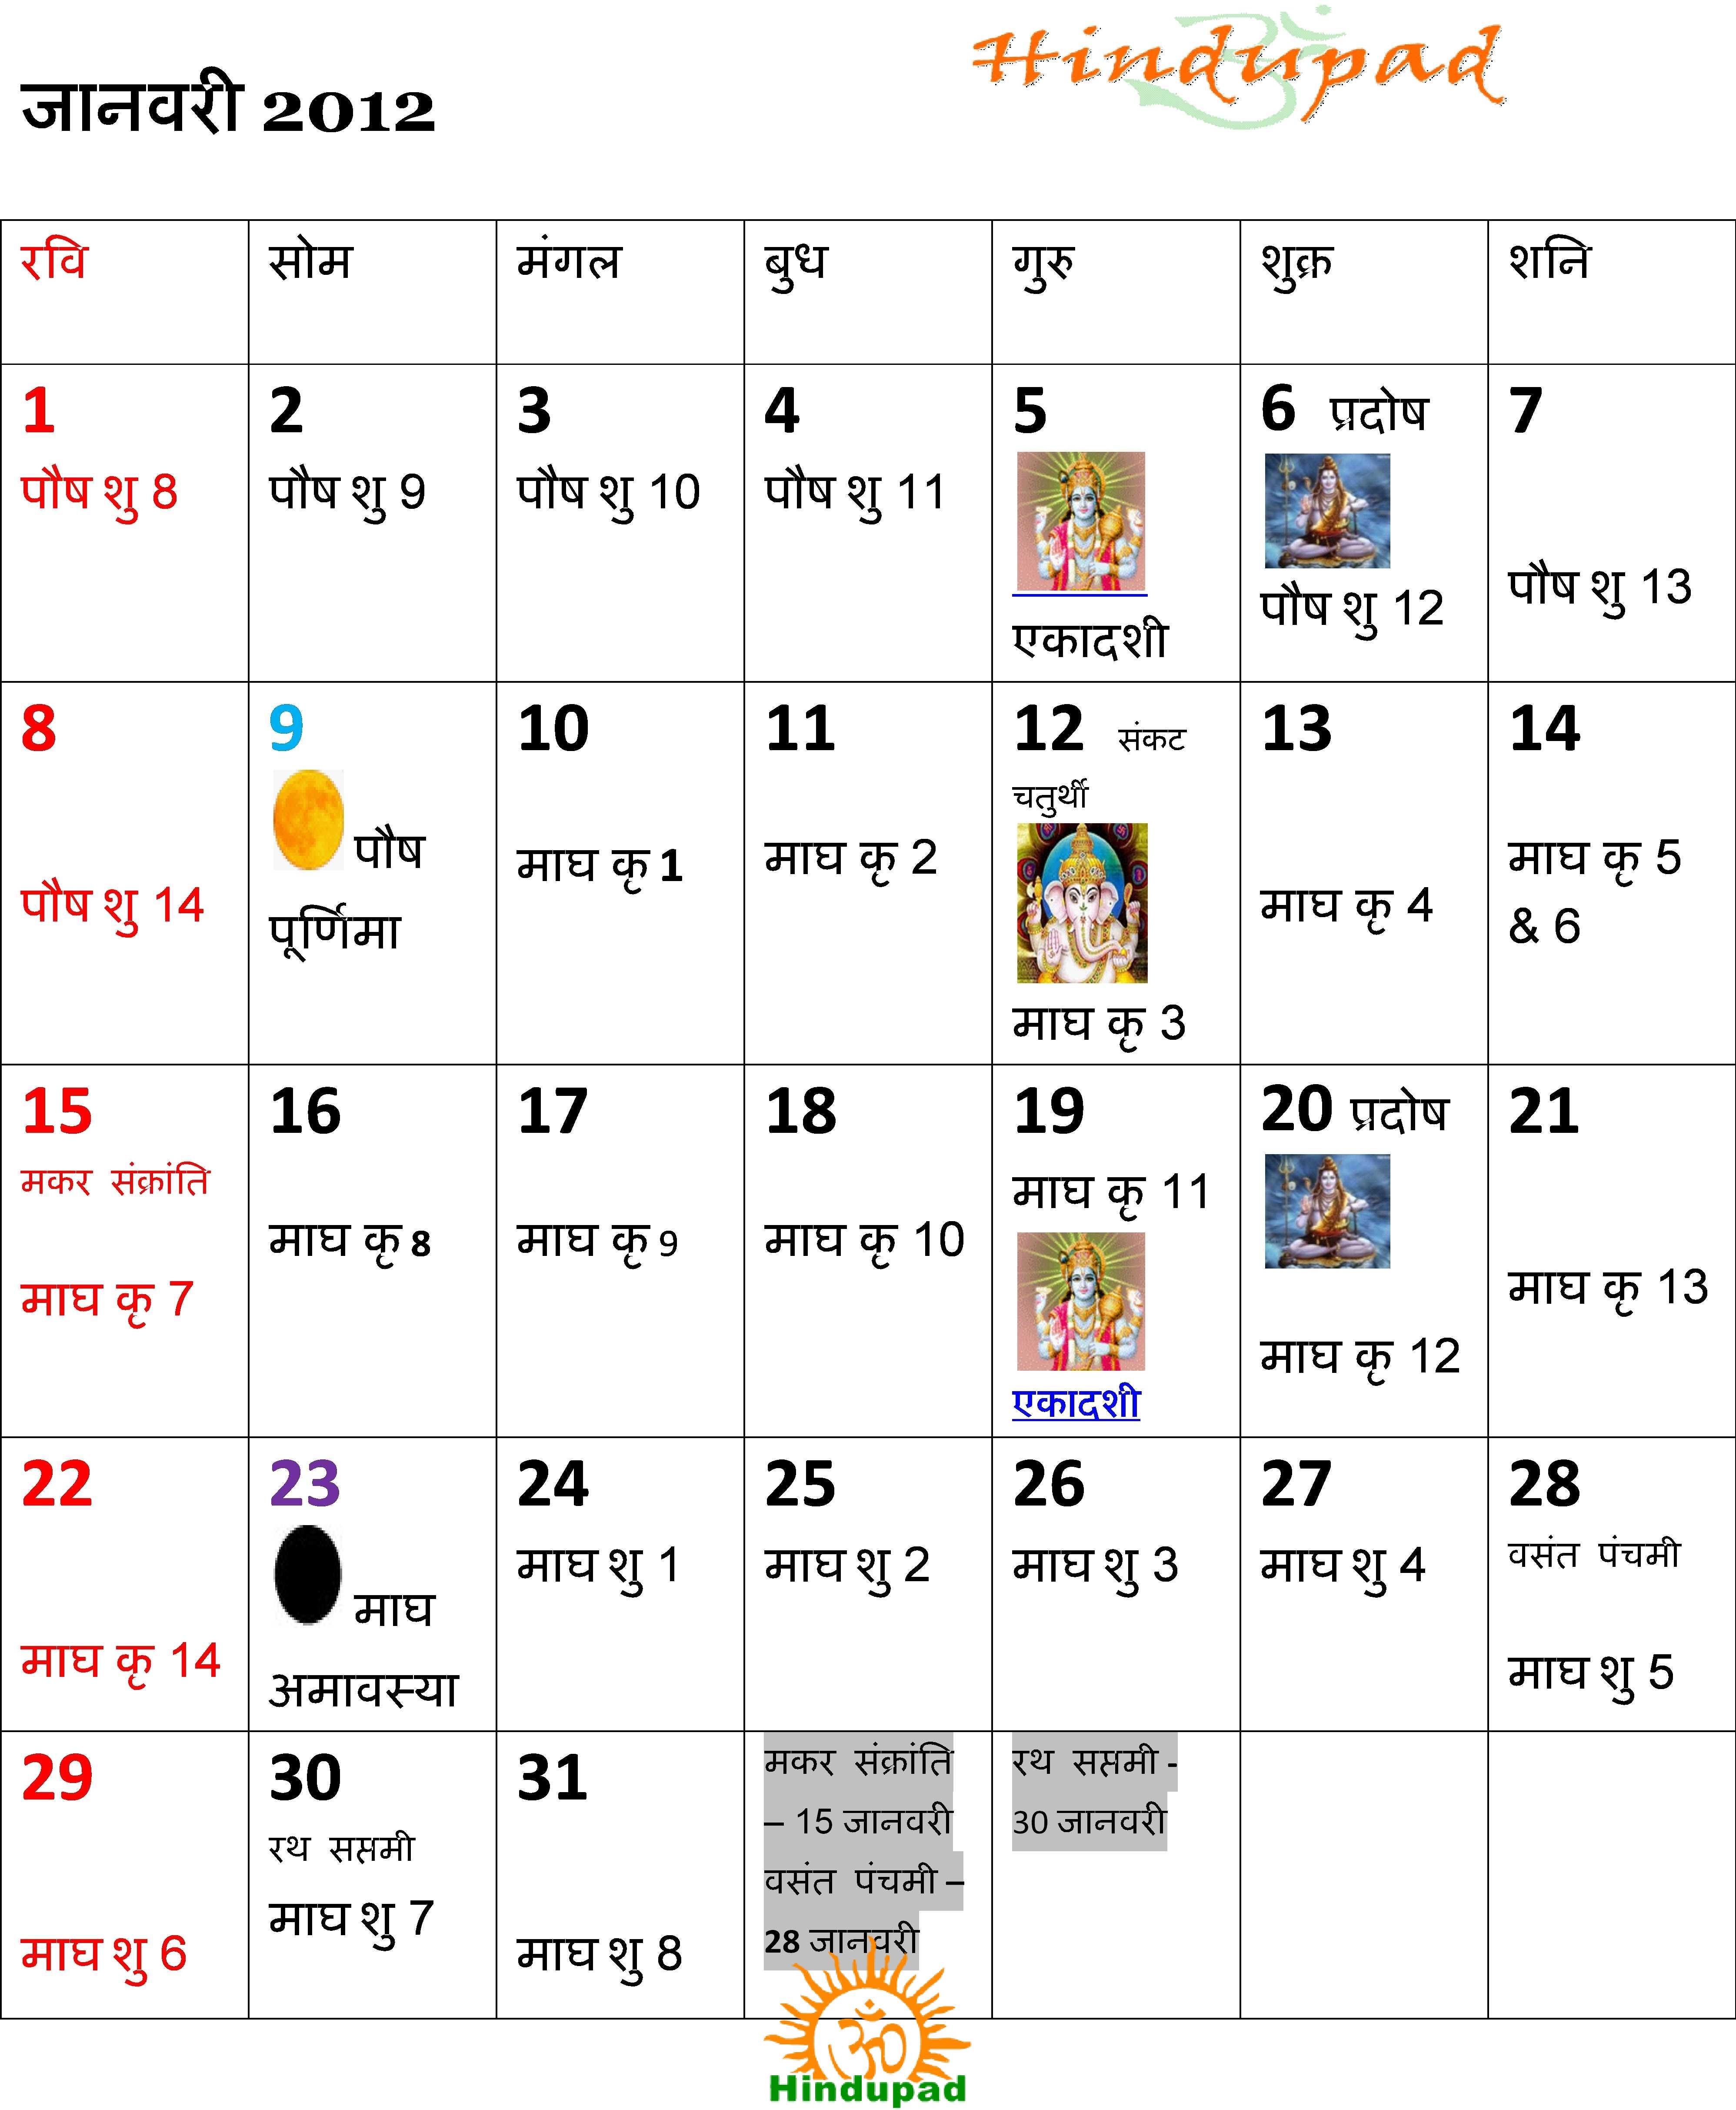 Hindi Panchang 2015 Pdf